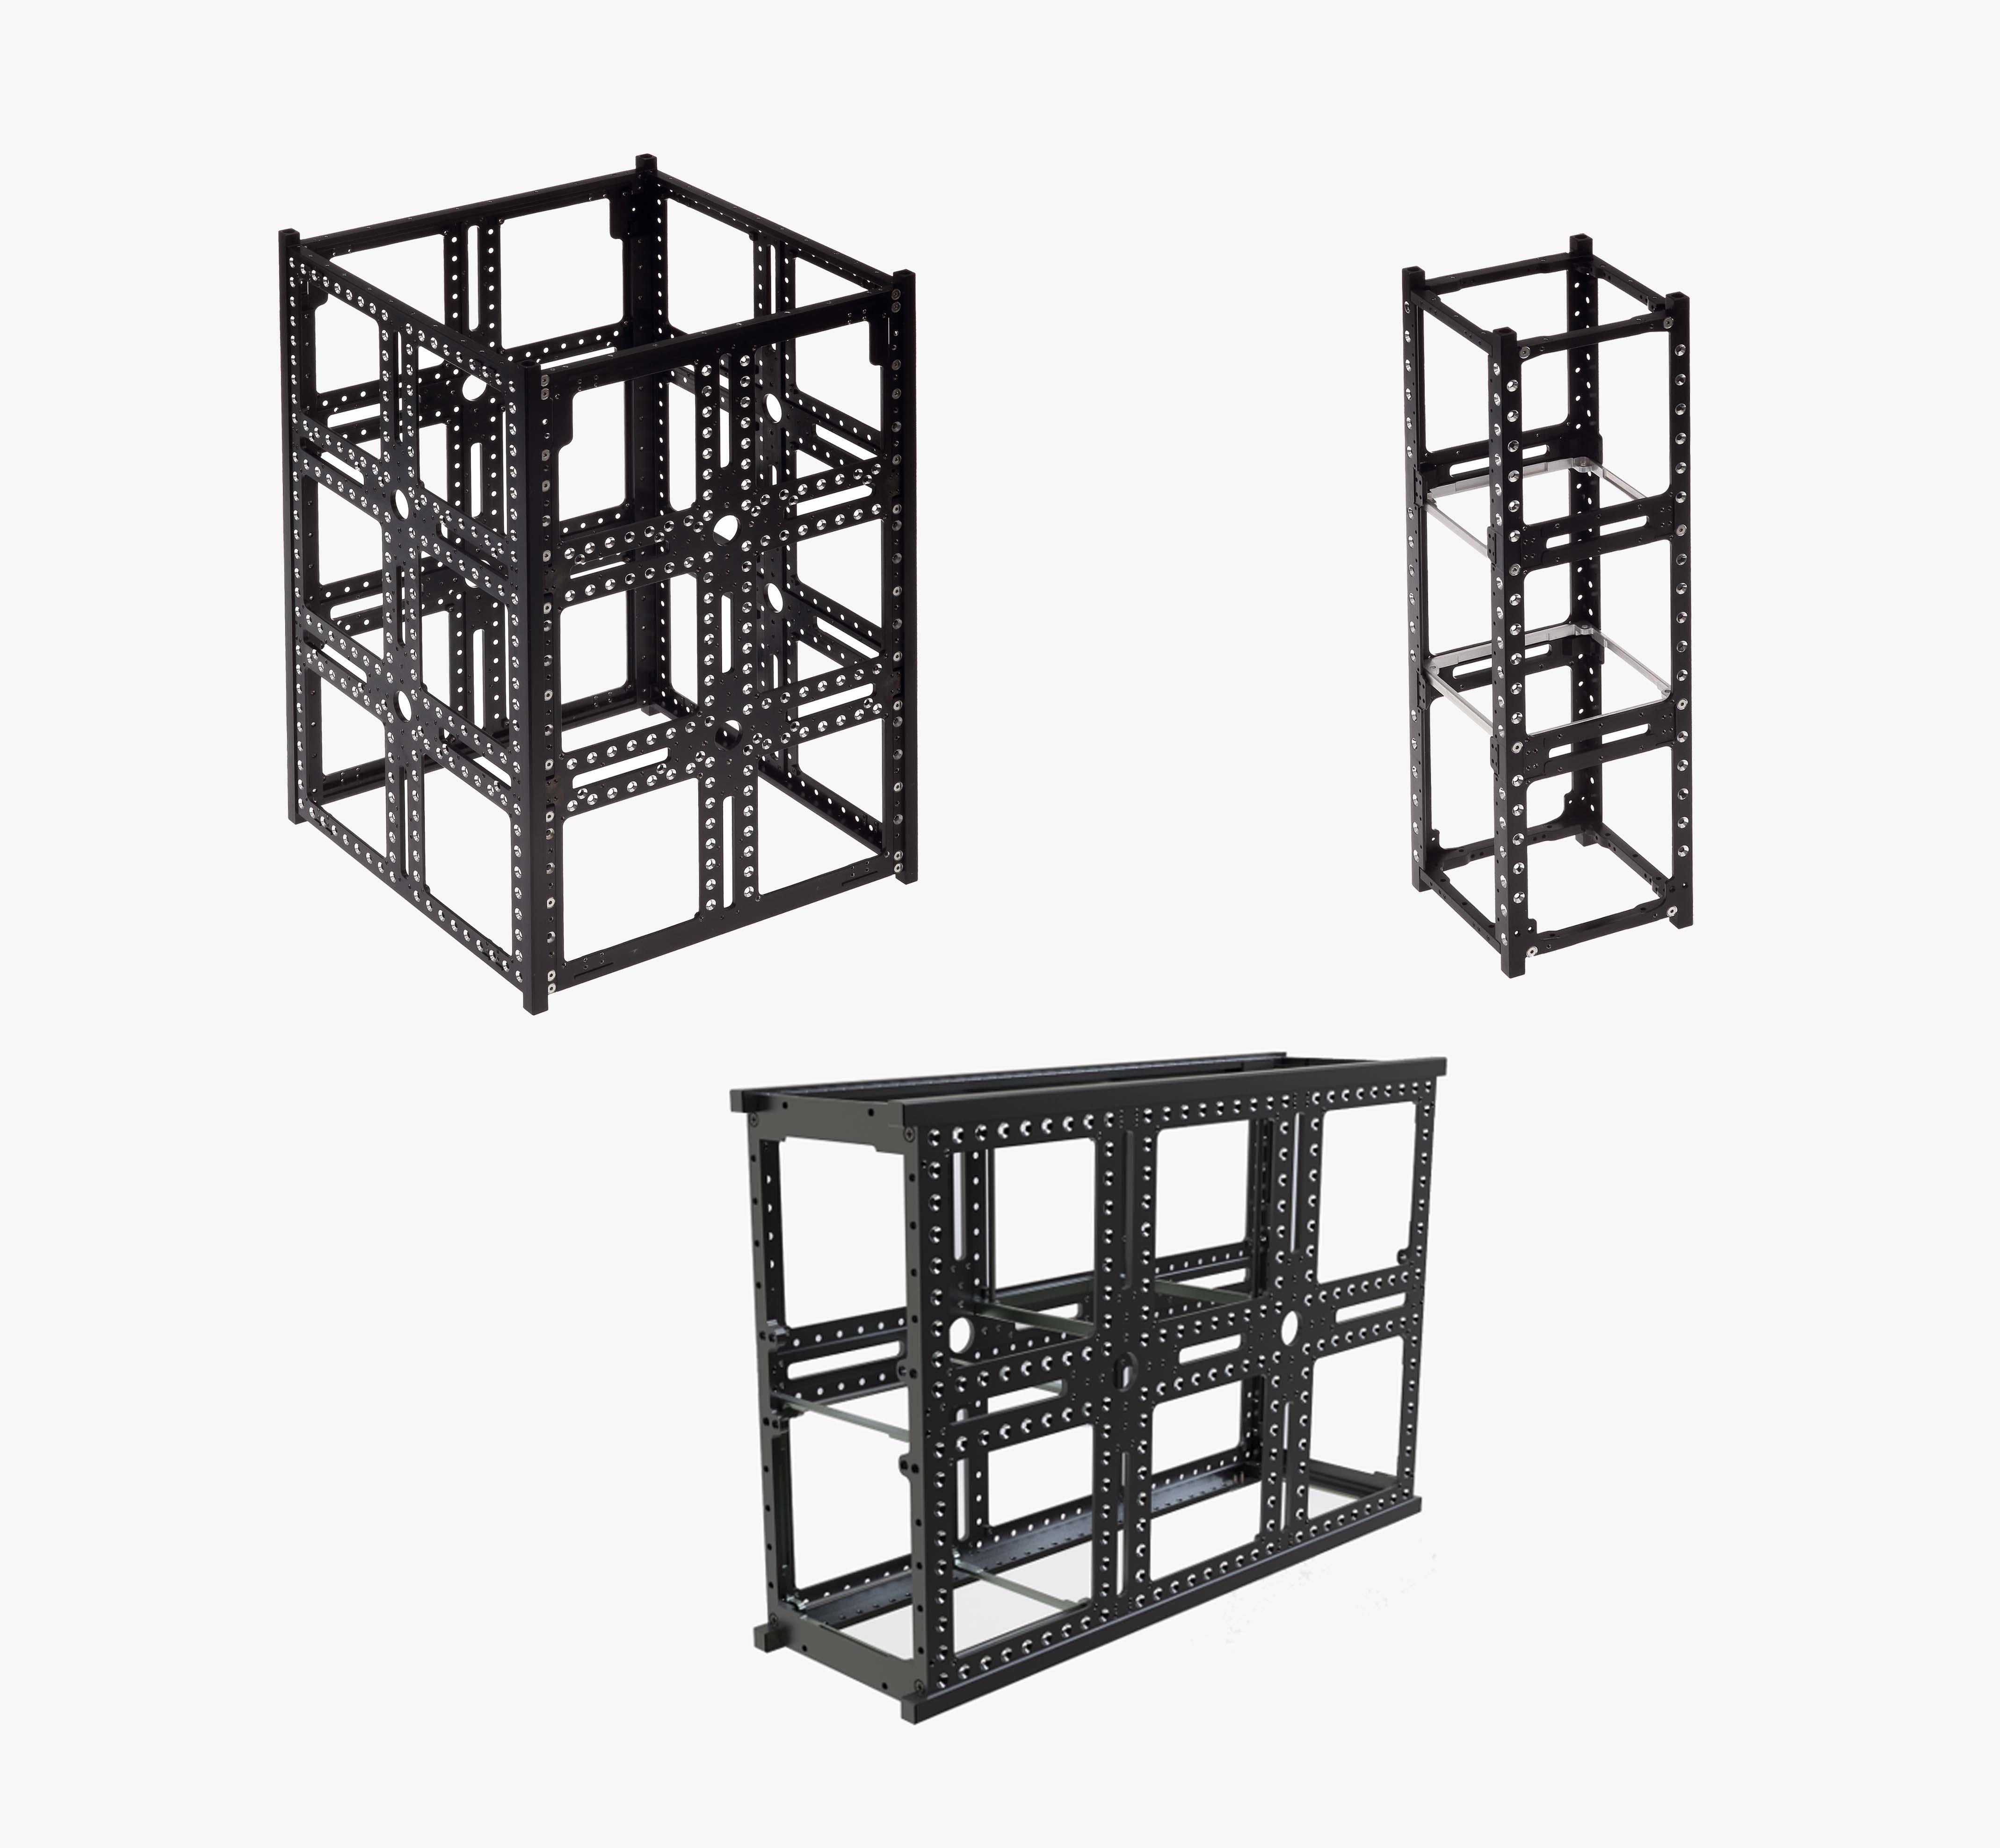 nanoavionics cubesat standard structure on satsearch